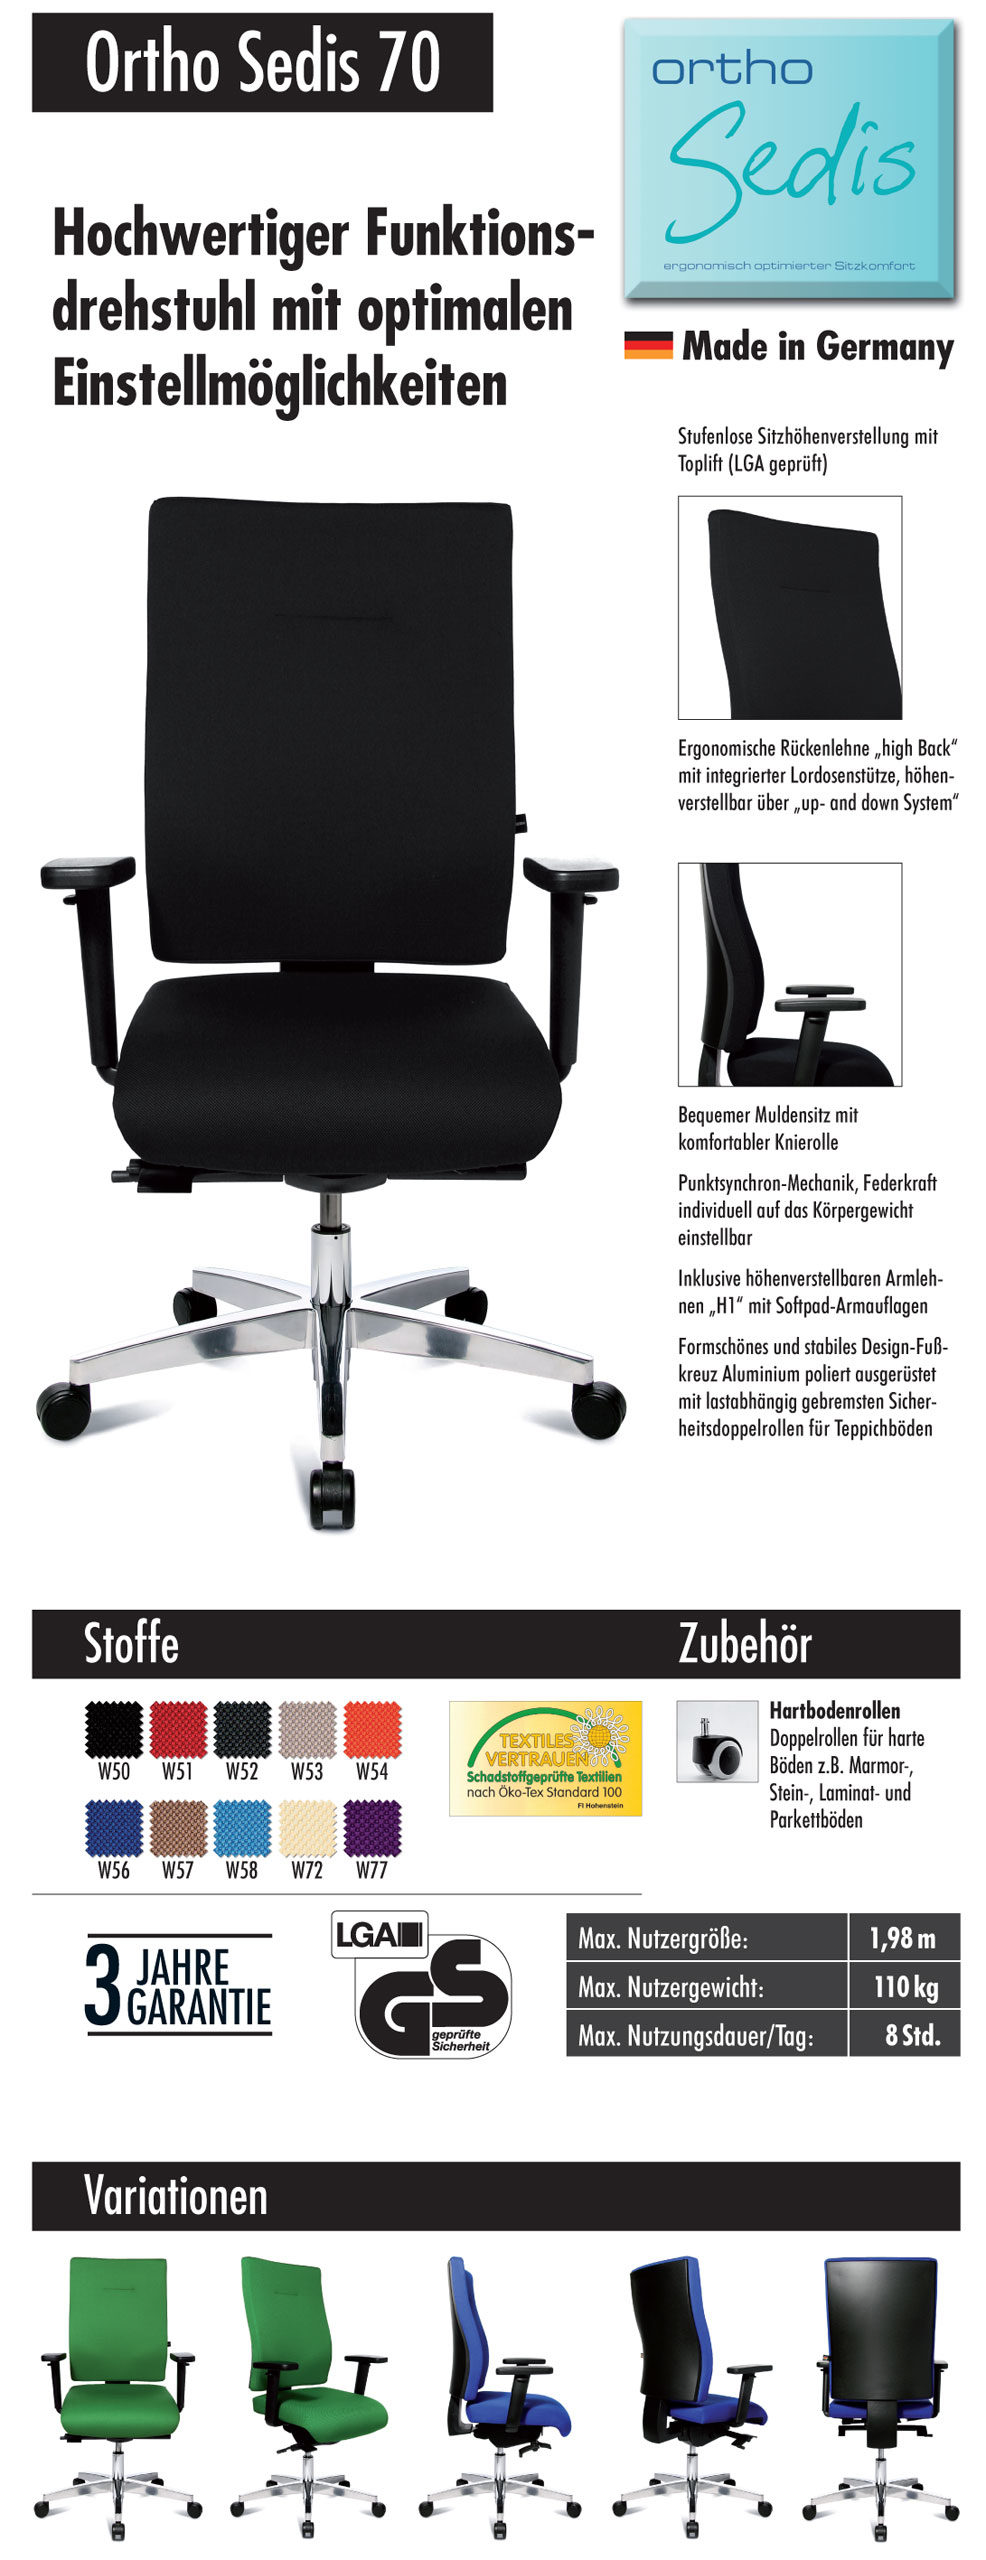 TOPSTAR Drehstuhl Bürostuhl ORTHOSEDIS 70, Stoff schwarz W50 ...